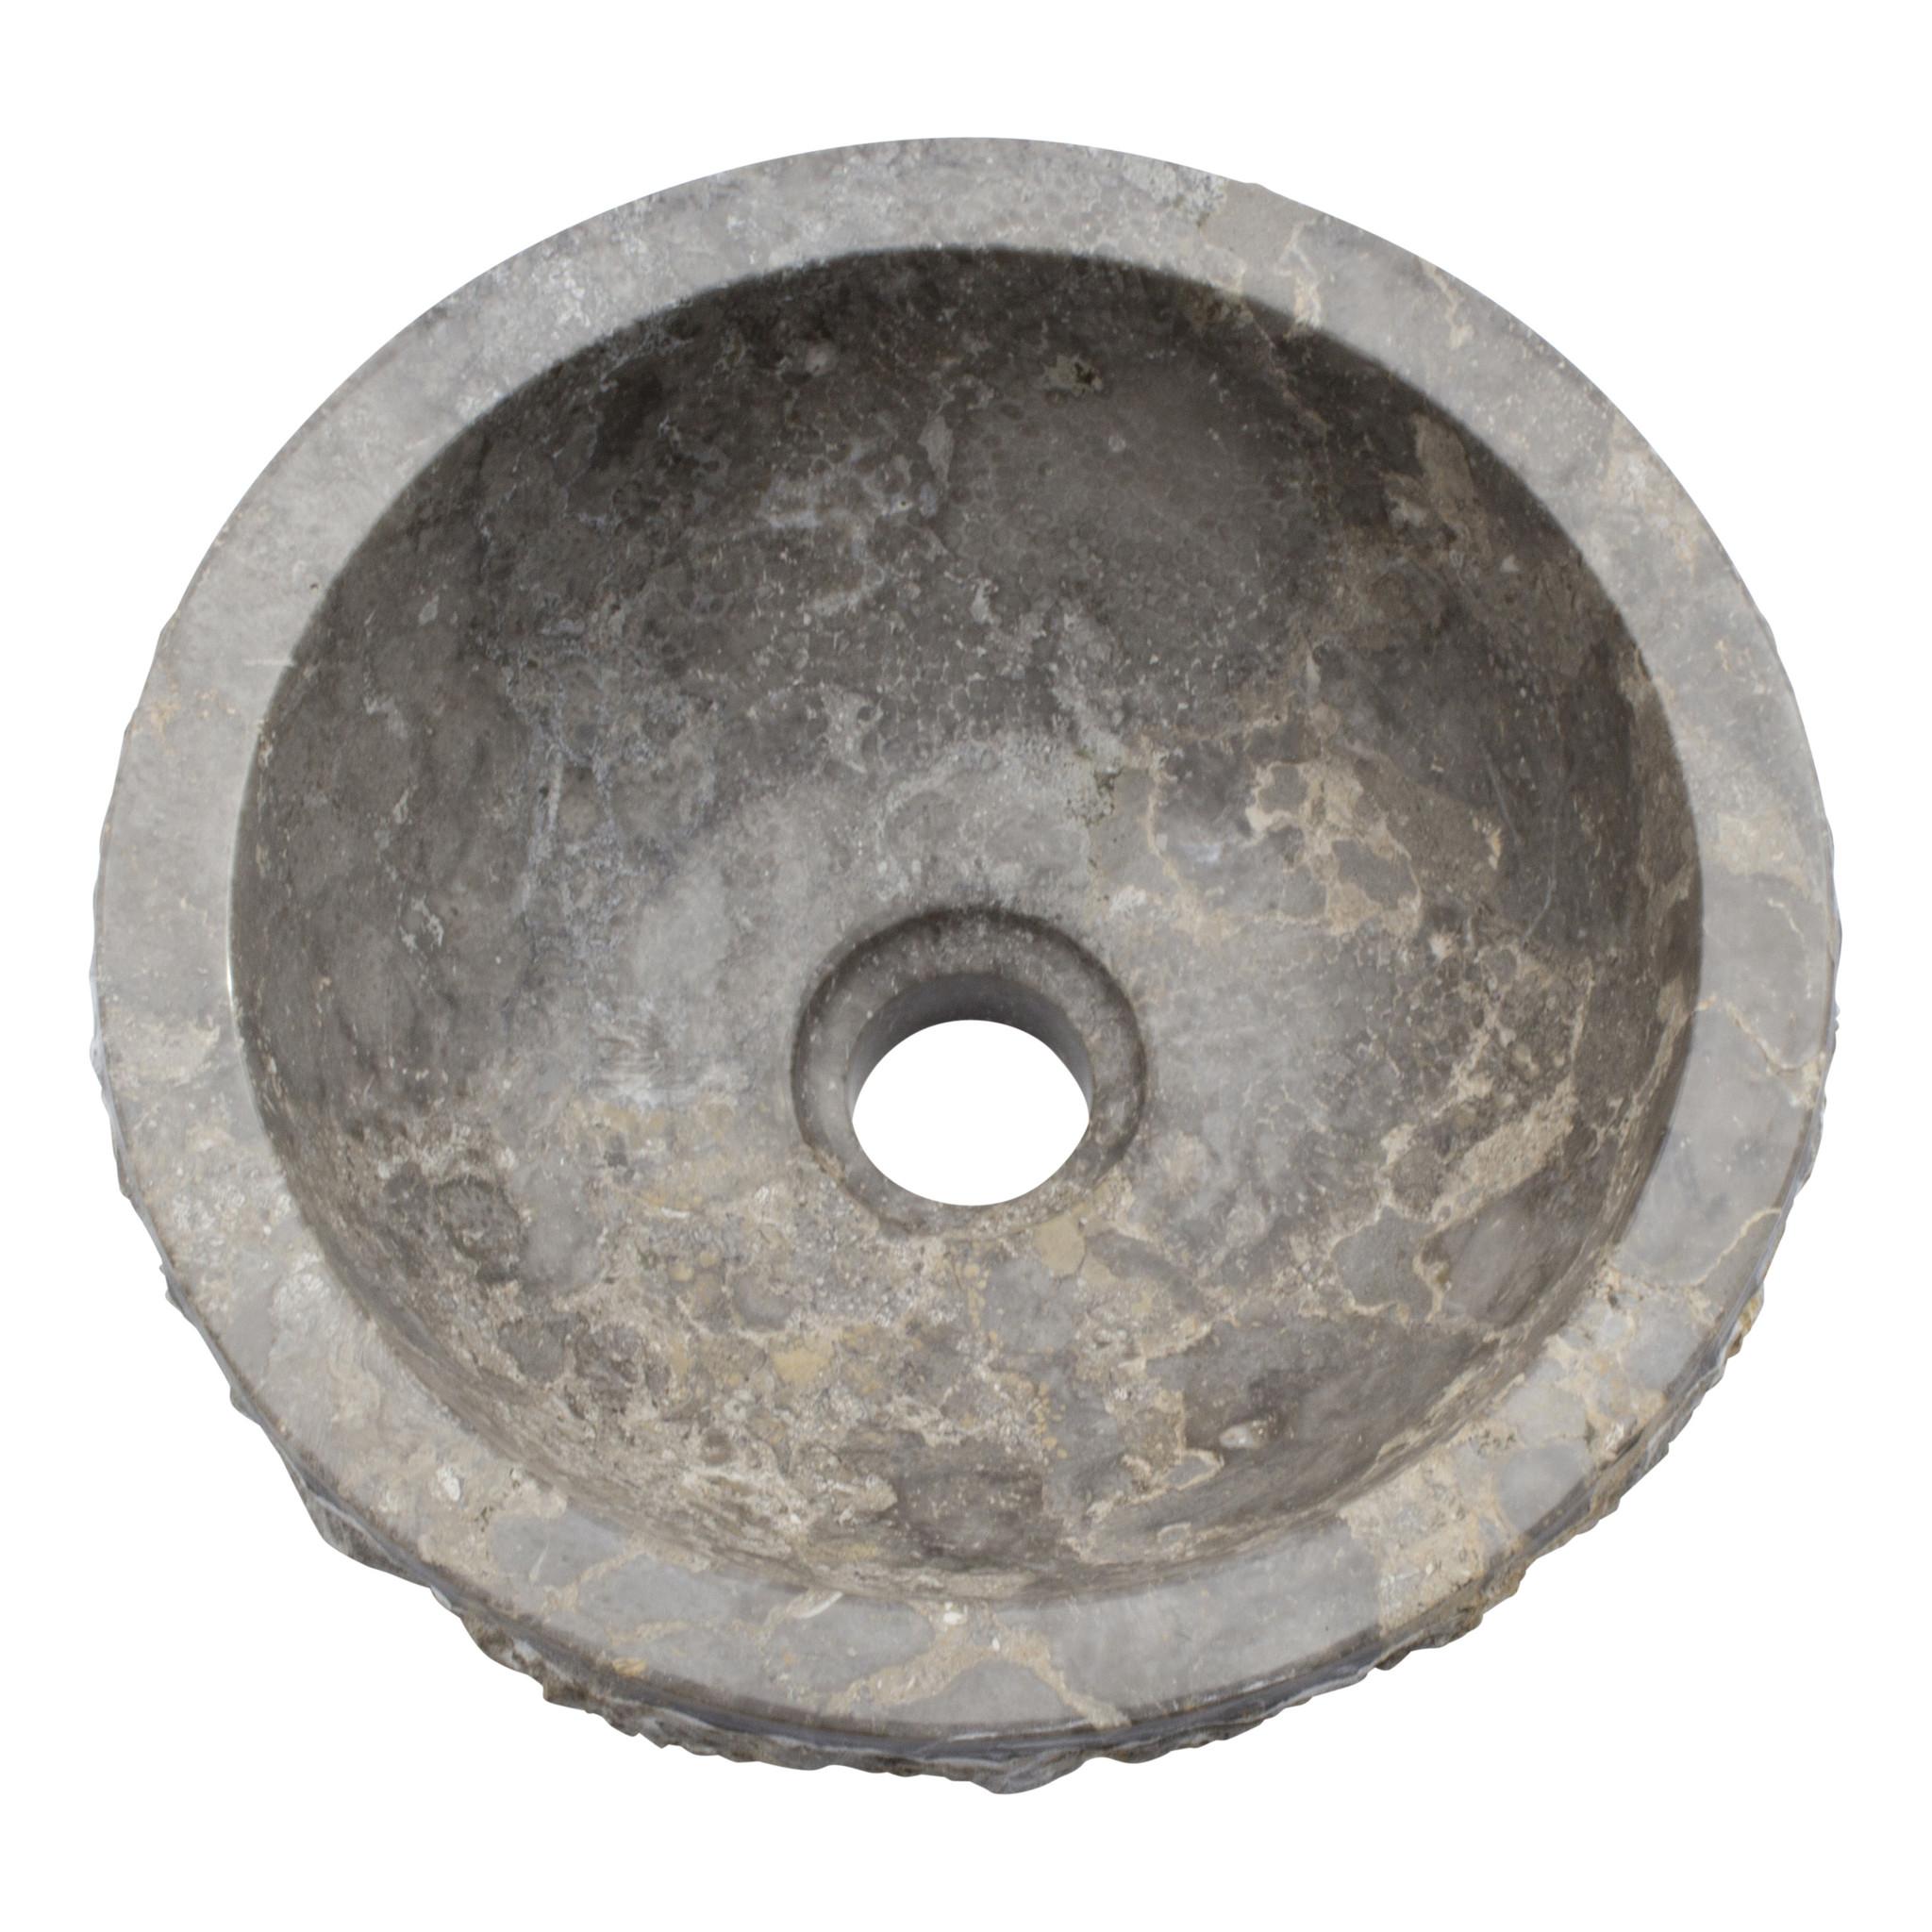 Indomarmer Grauem Marmor Waschbecken Full-Marmo  Ø 30 x H 12 cm